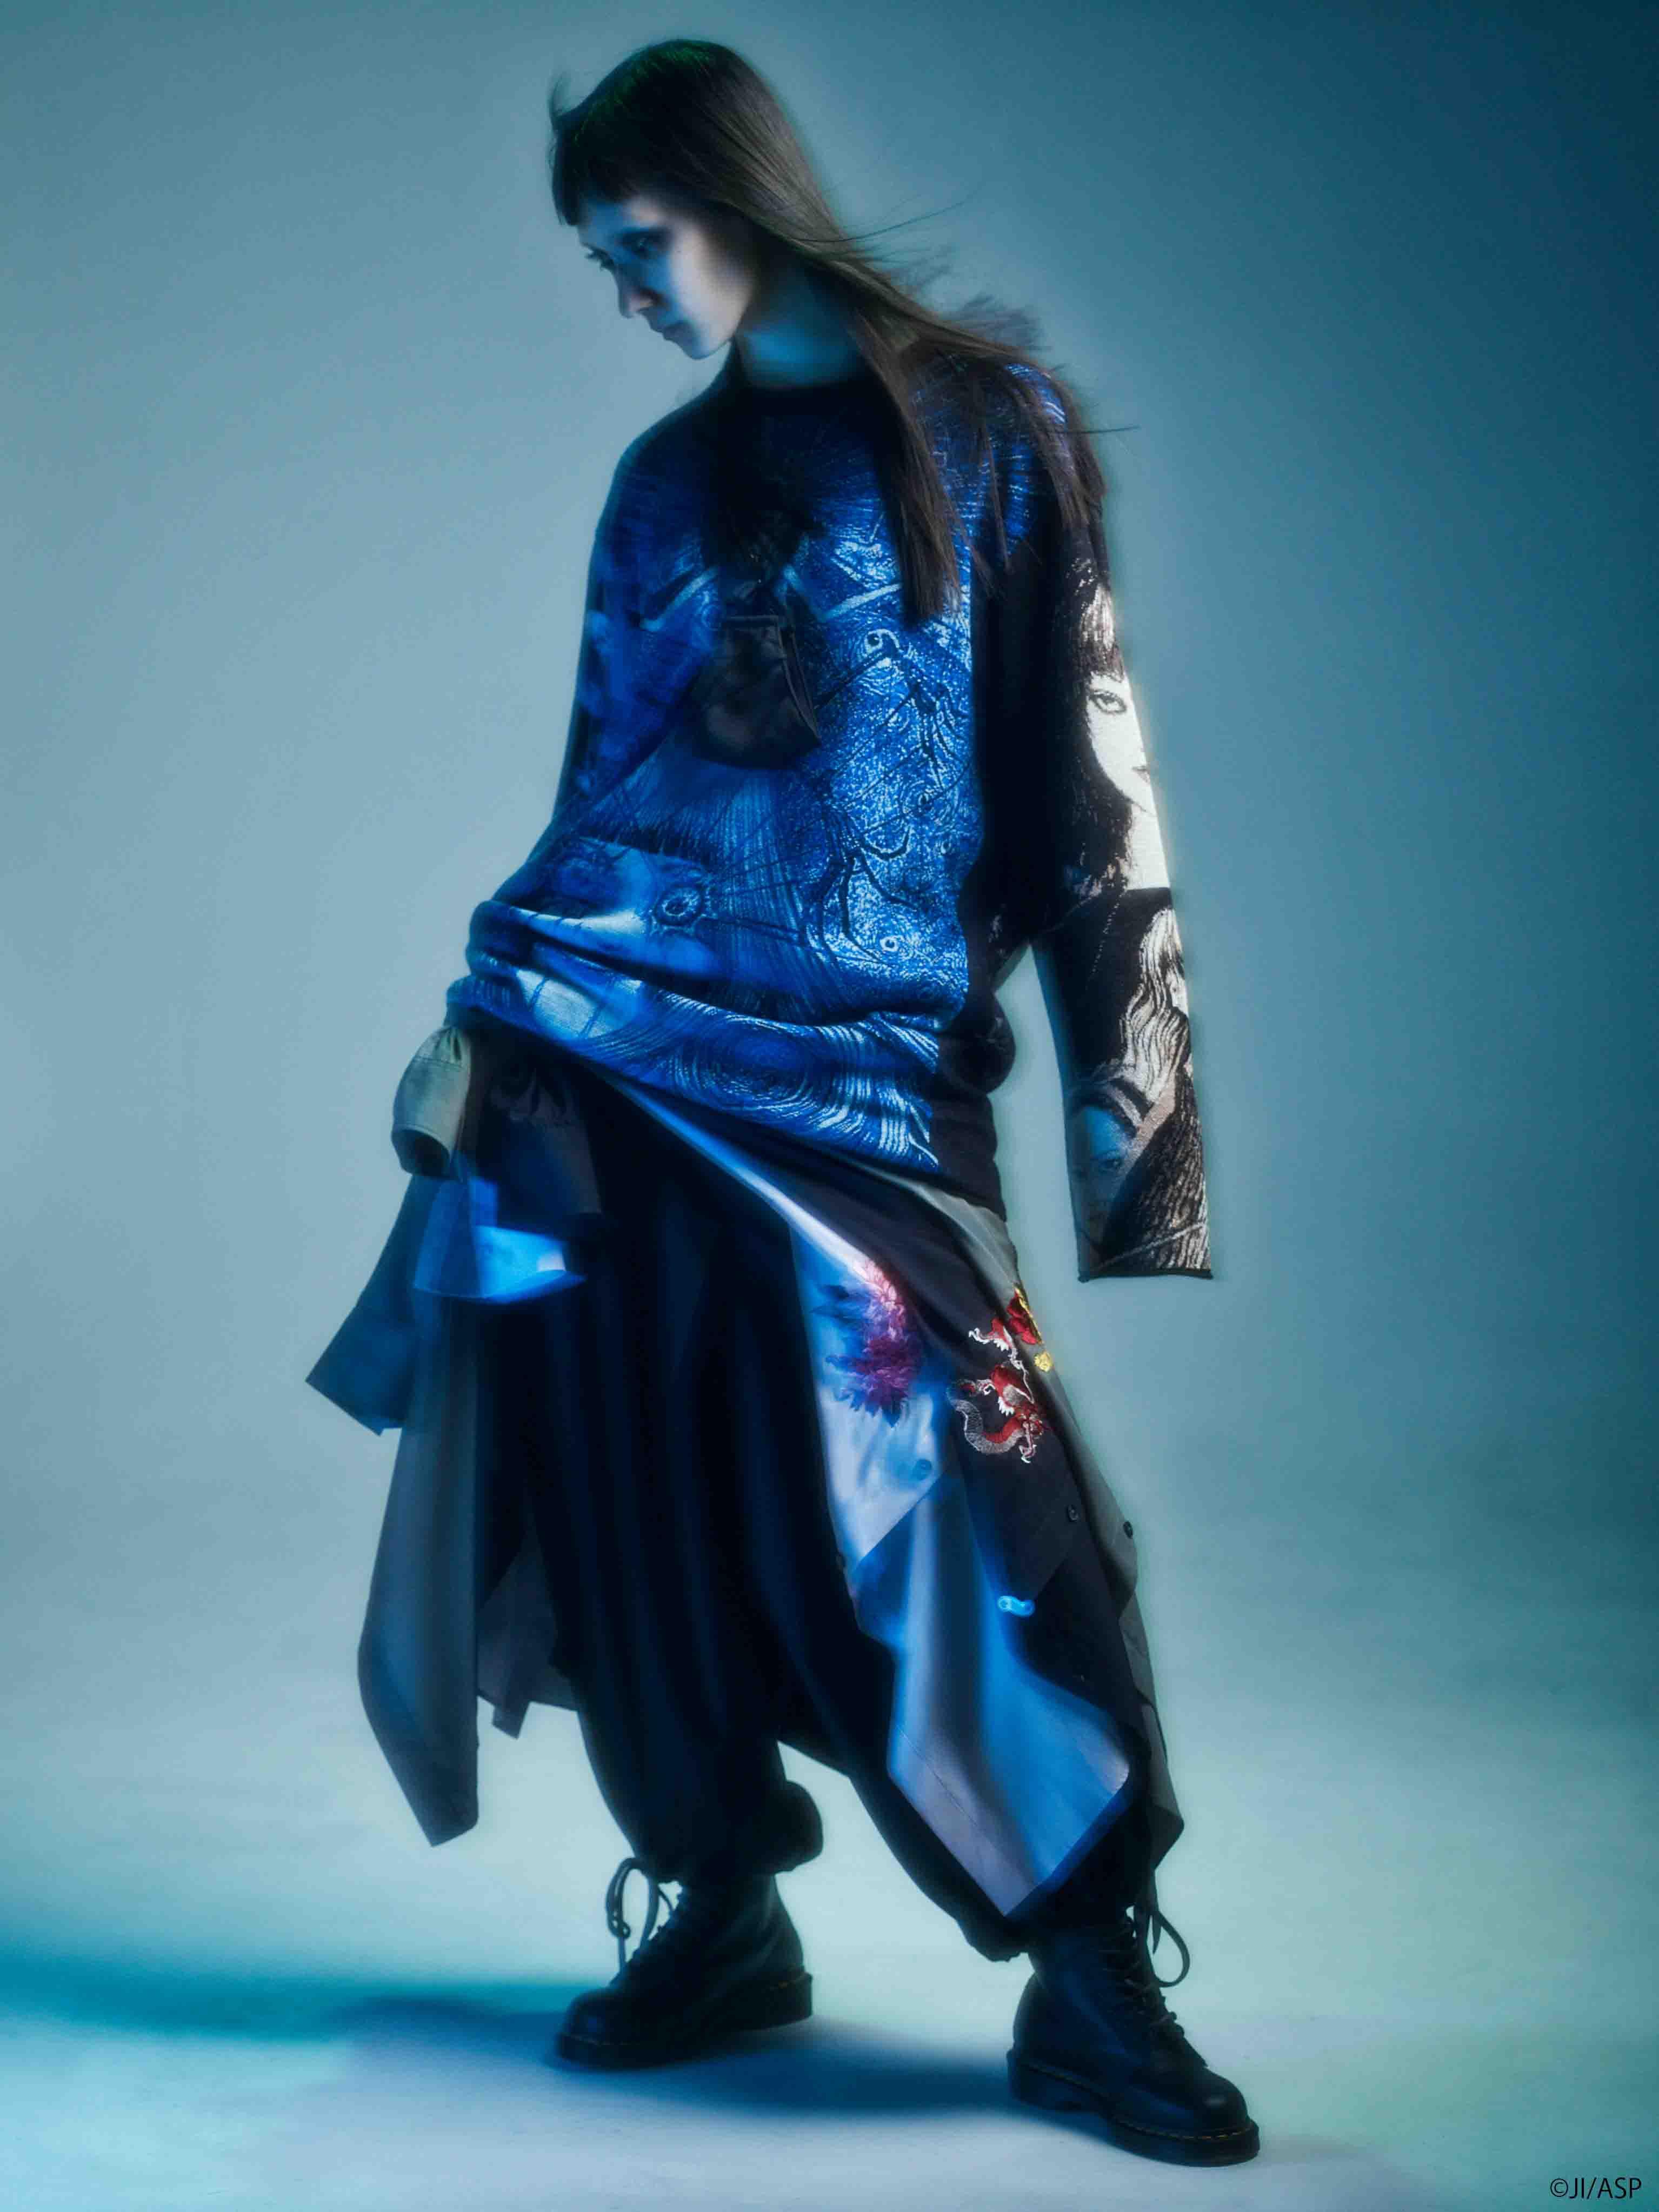 Junji ITO Twisted Visions Hameauze Jacquard Crew Neck Pullover